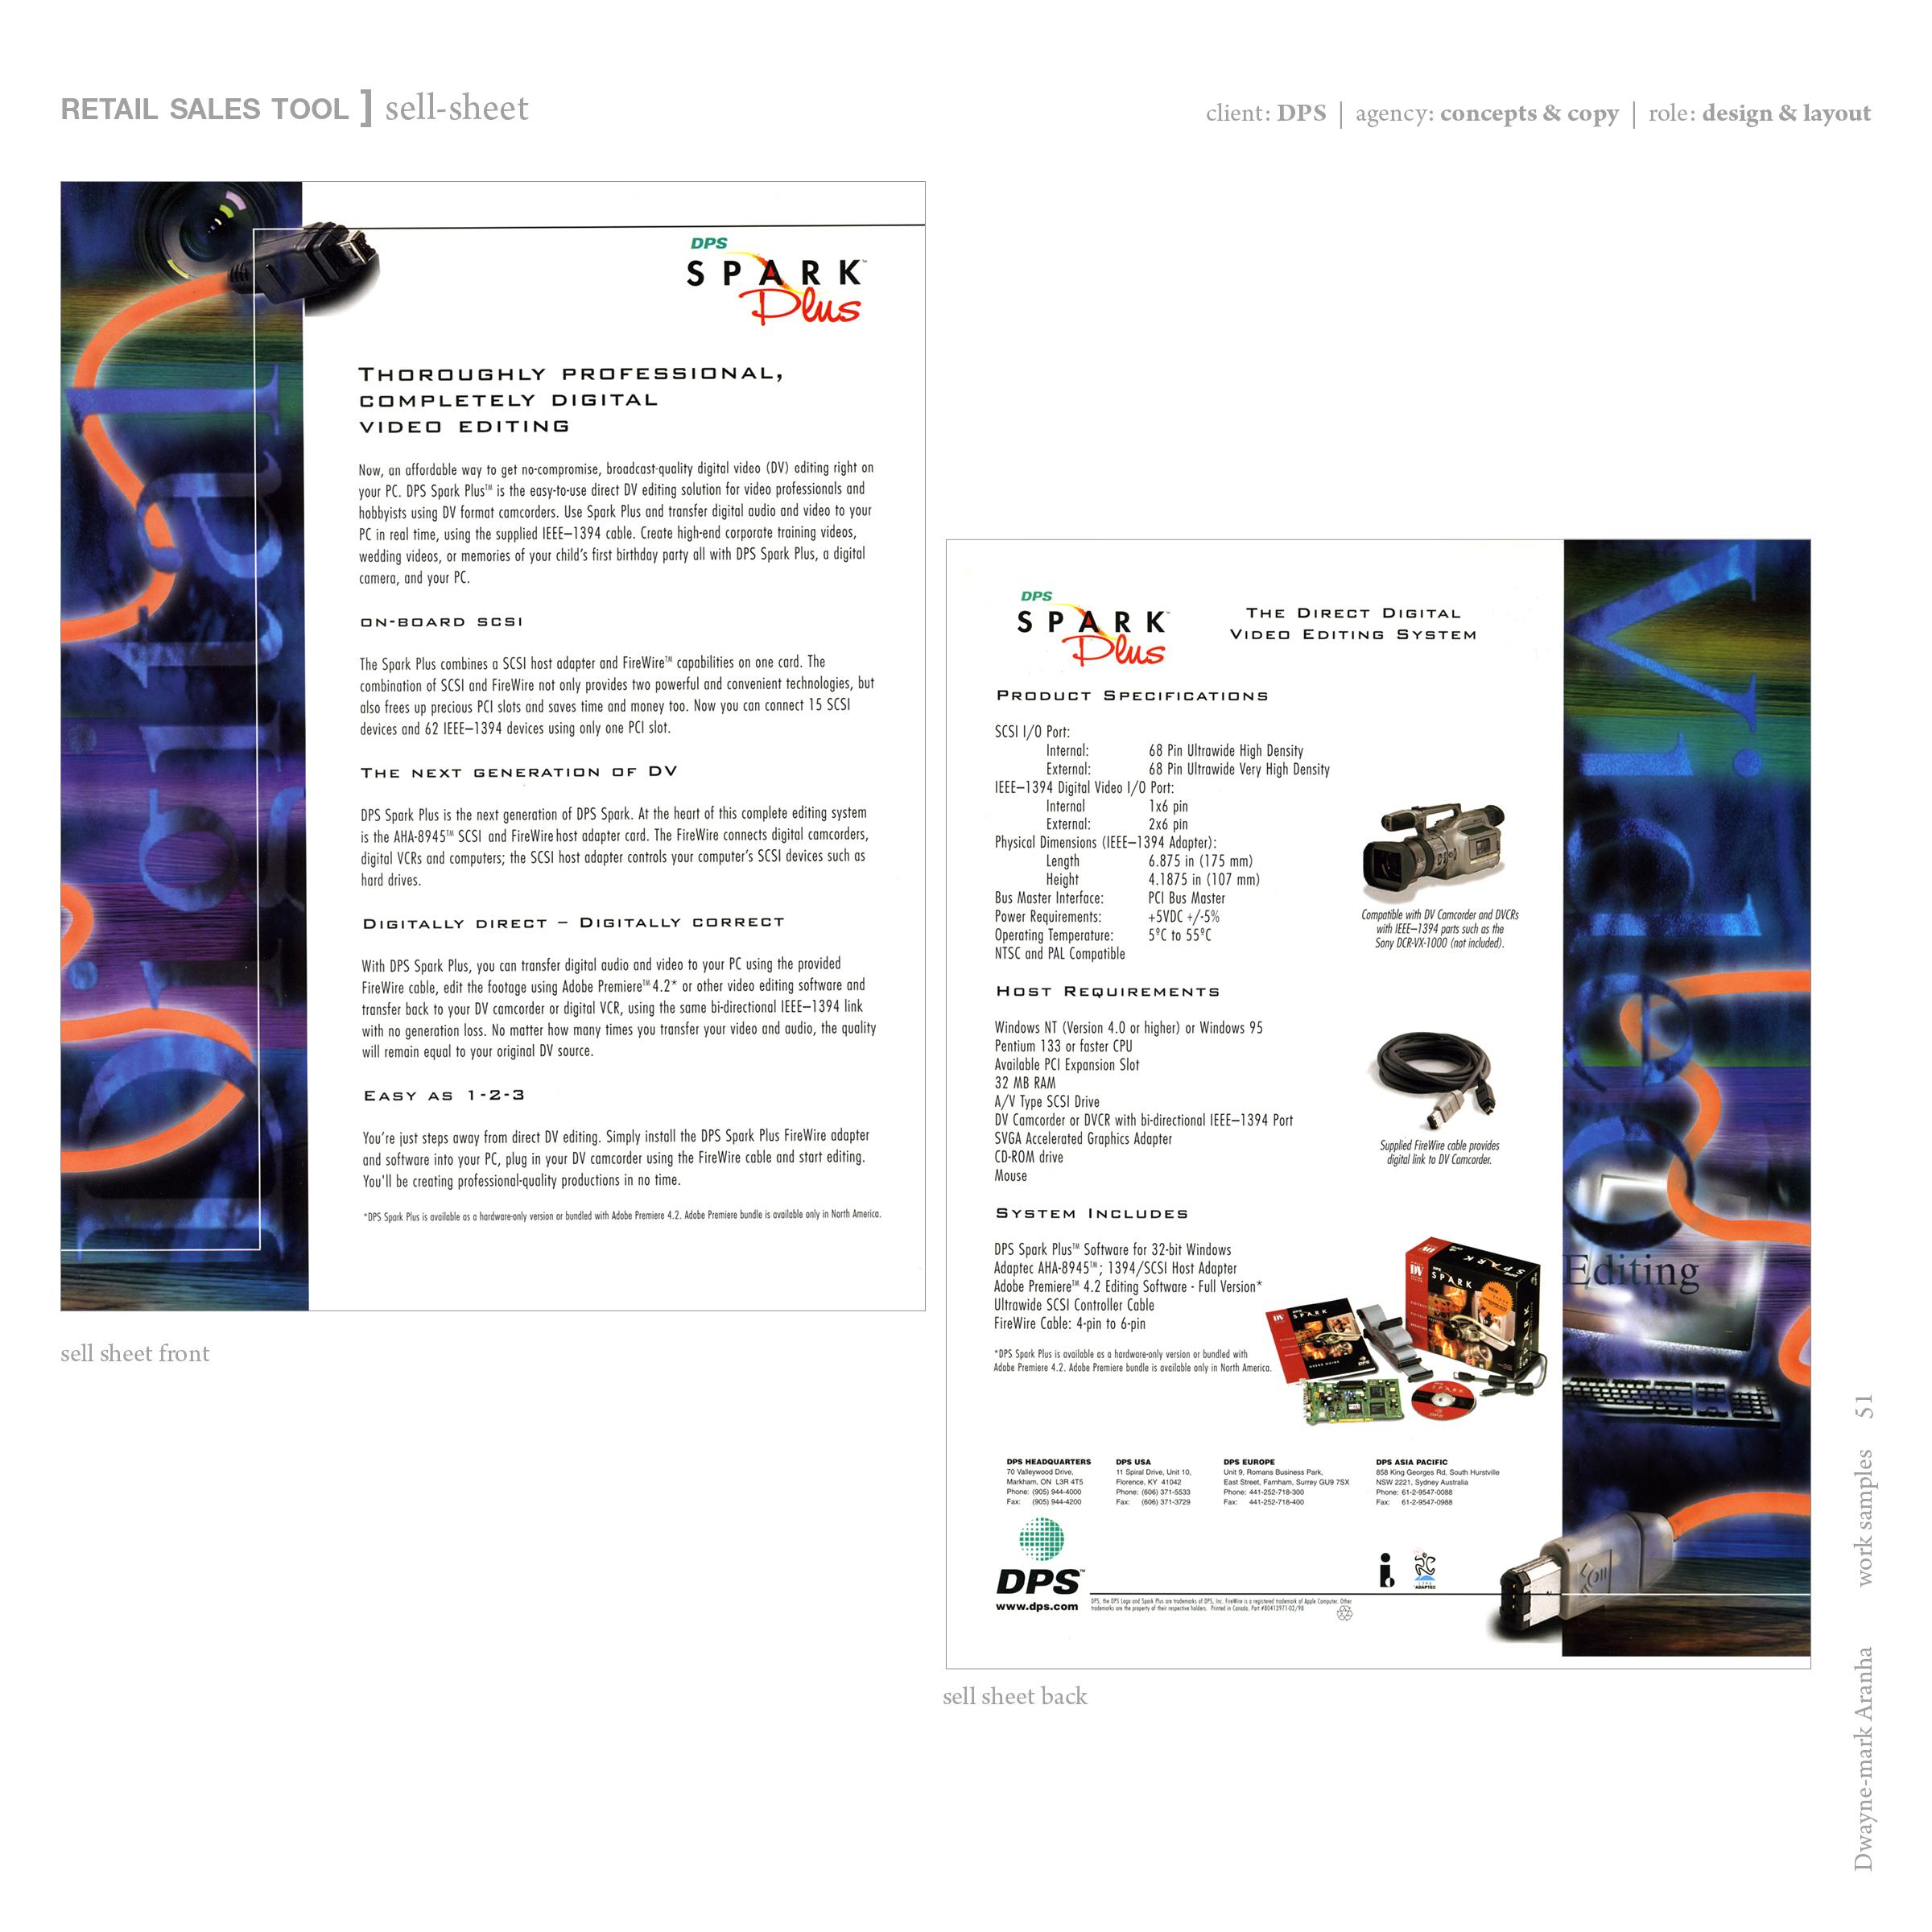 DmA_samples_HR_51